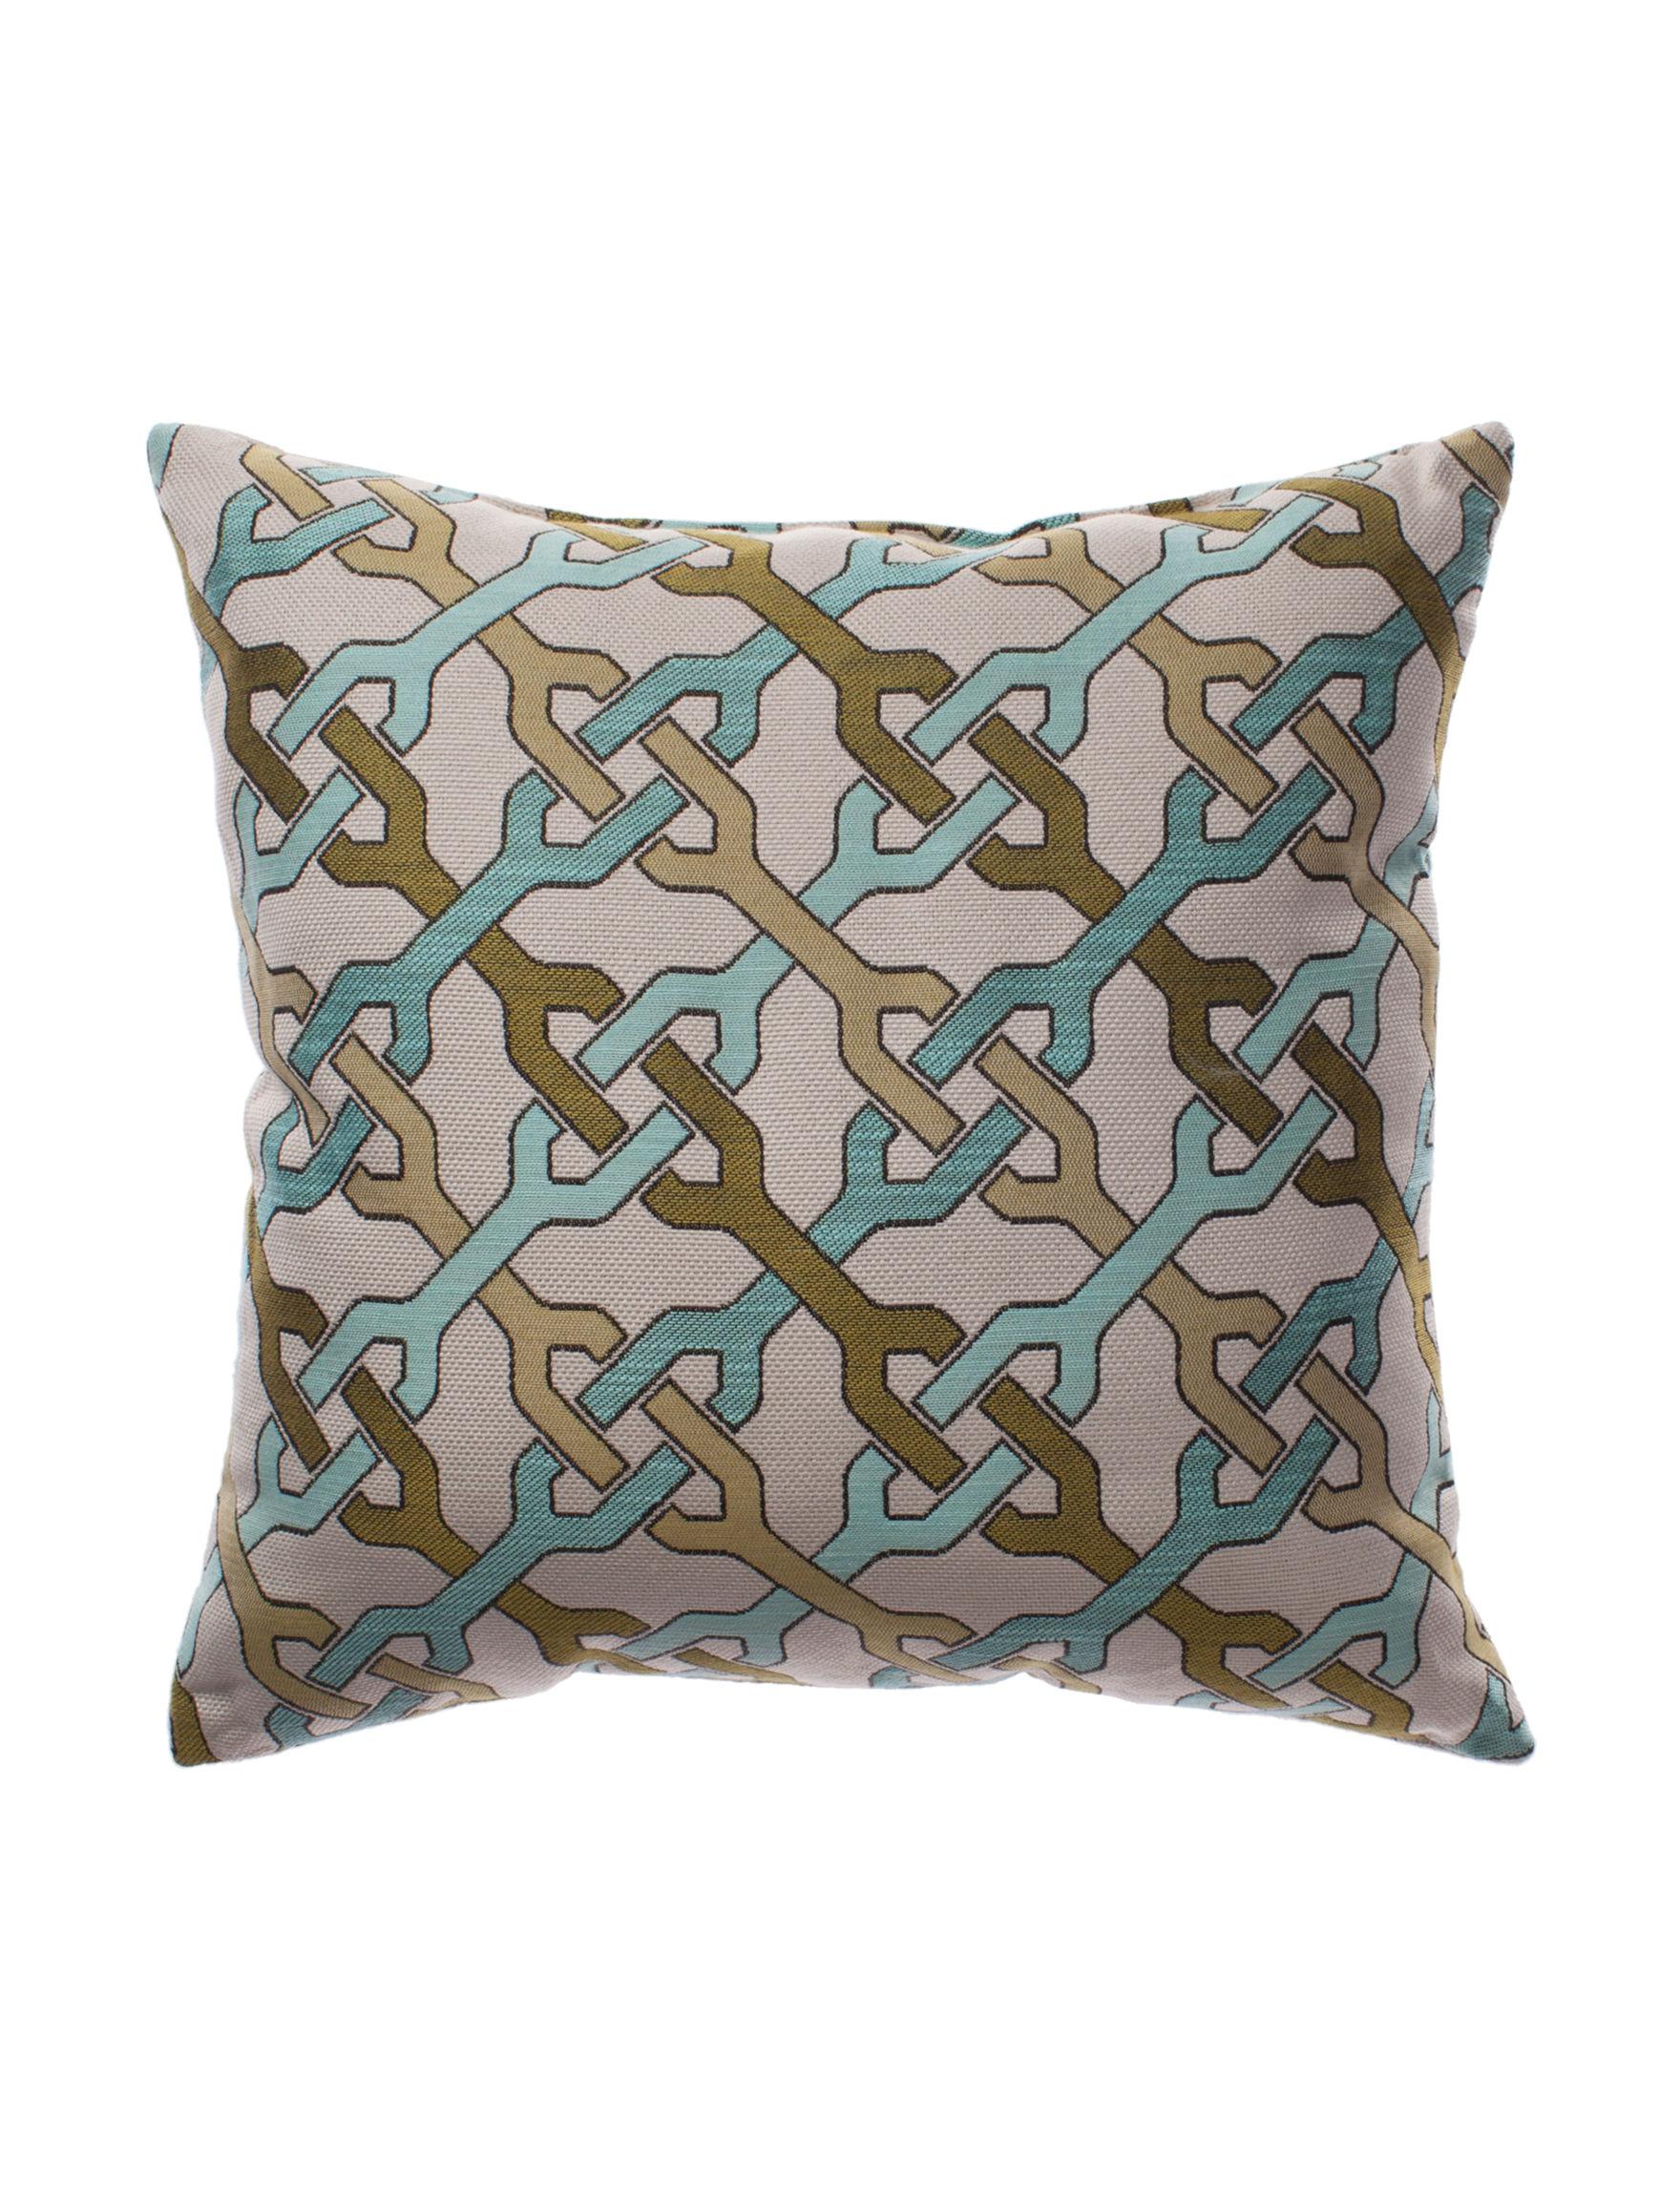 Home Fashions International Beige / Multi Decorative Pillows